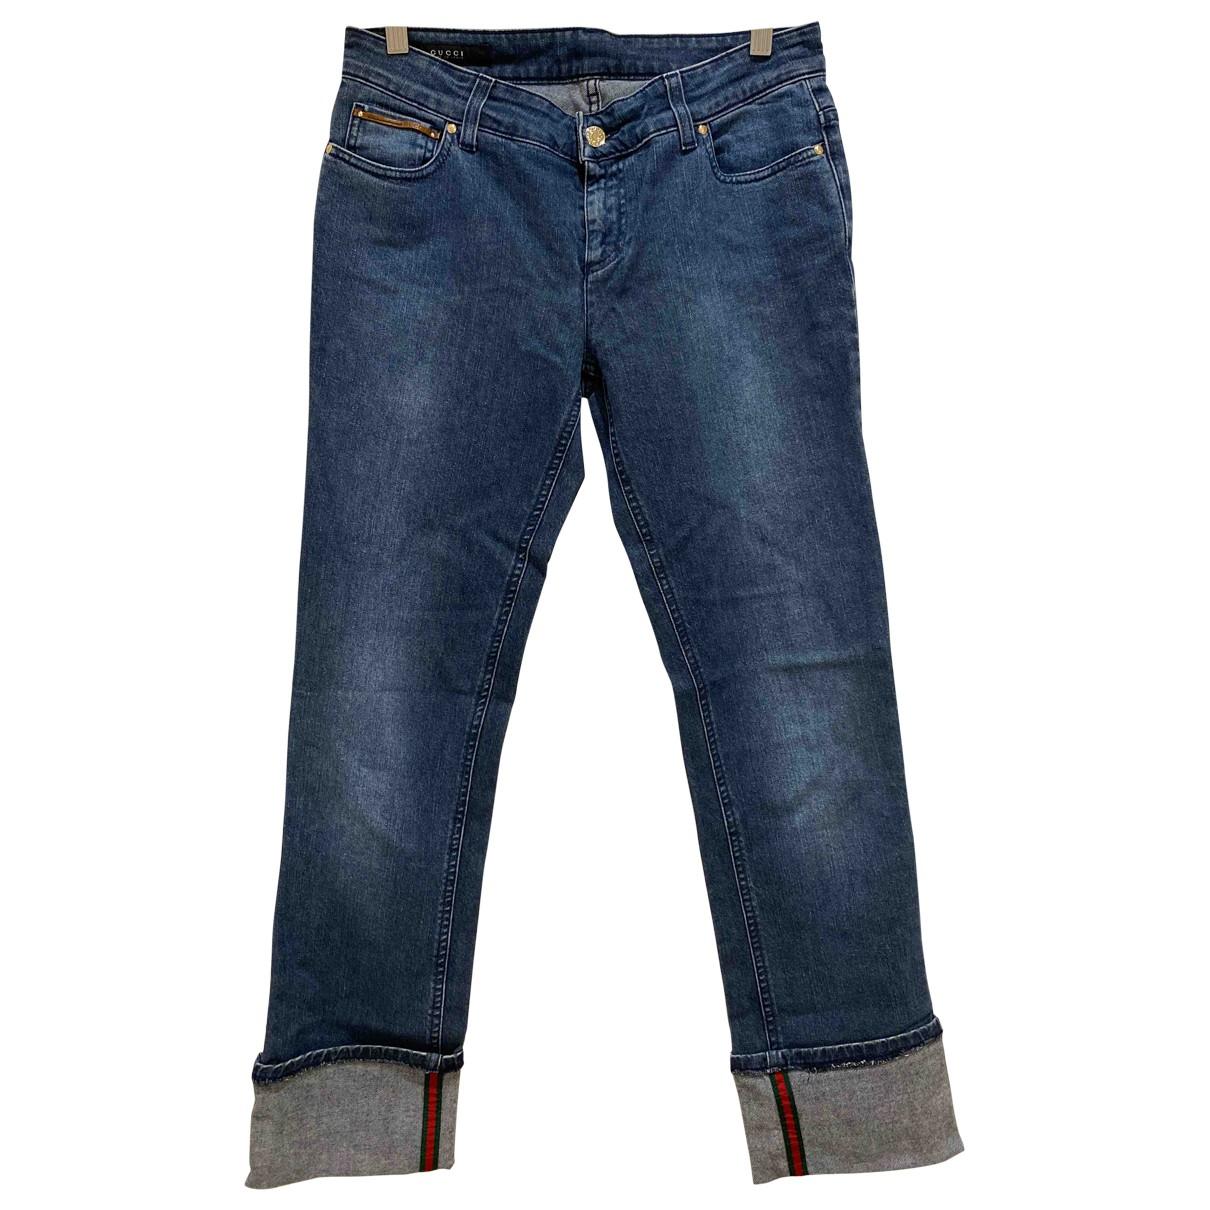 Gucci N Blue Denim - Jeans Jeans for Women 38 FR